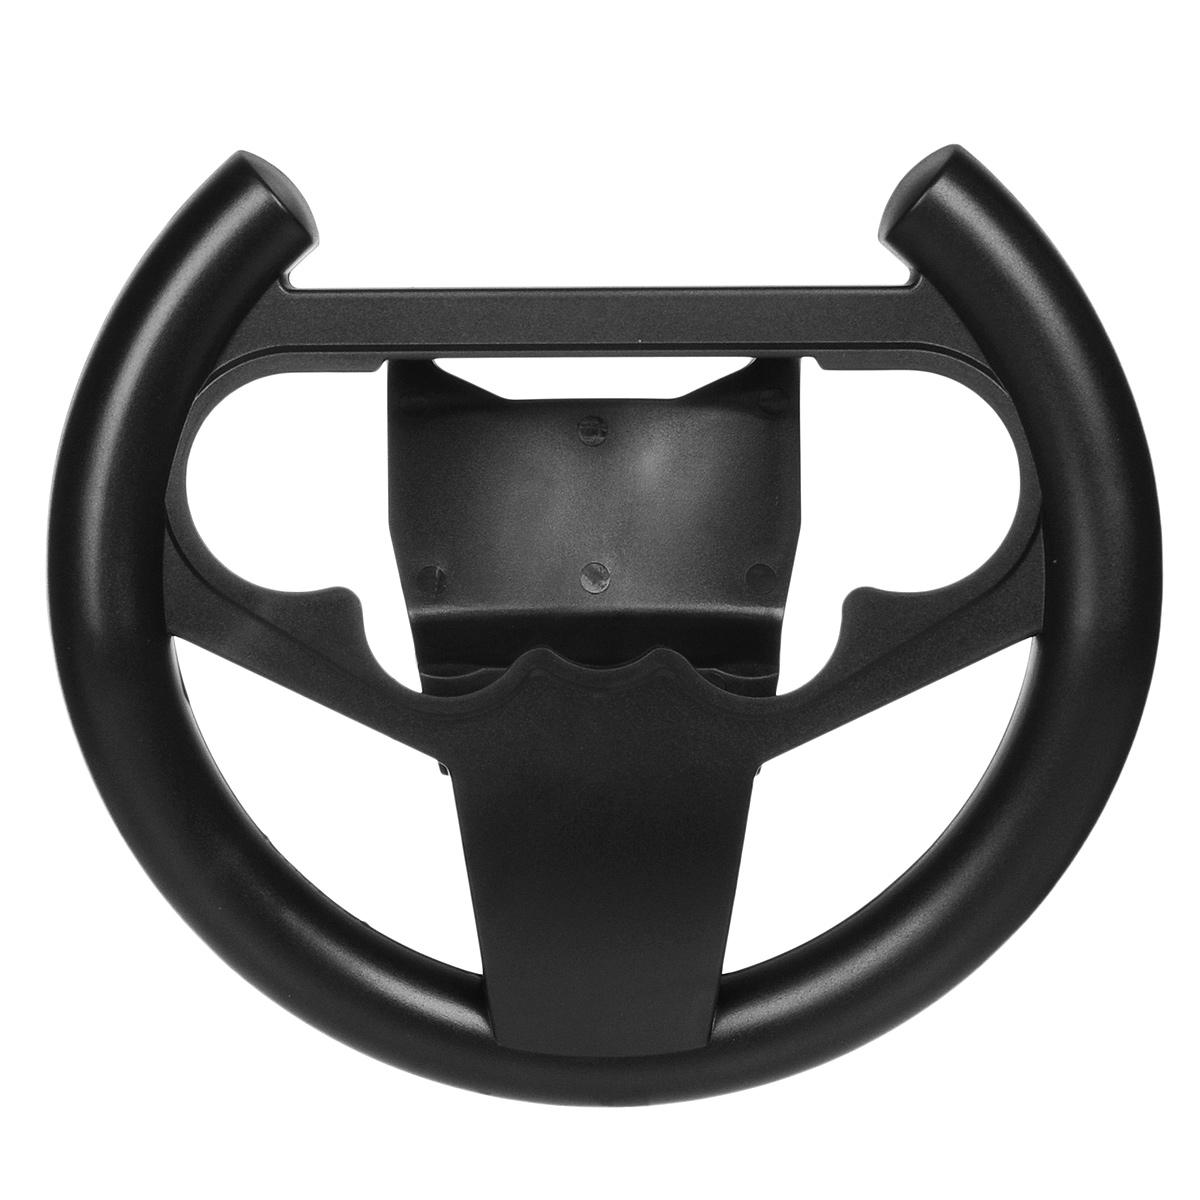 Руль Black Horns для геймпада PS4 руль для самоката proto classic slayer v2 26h x 24w flat black